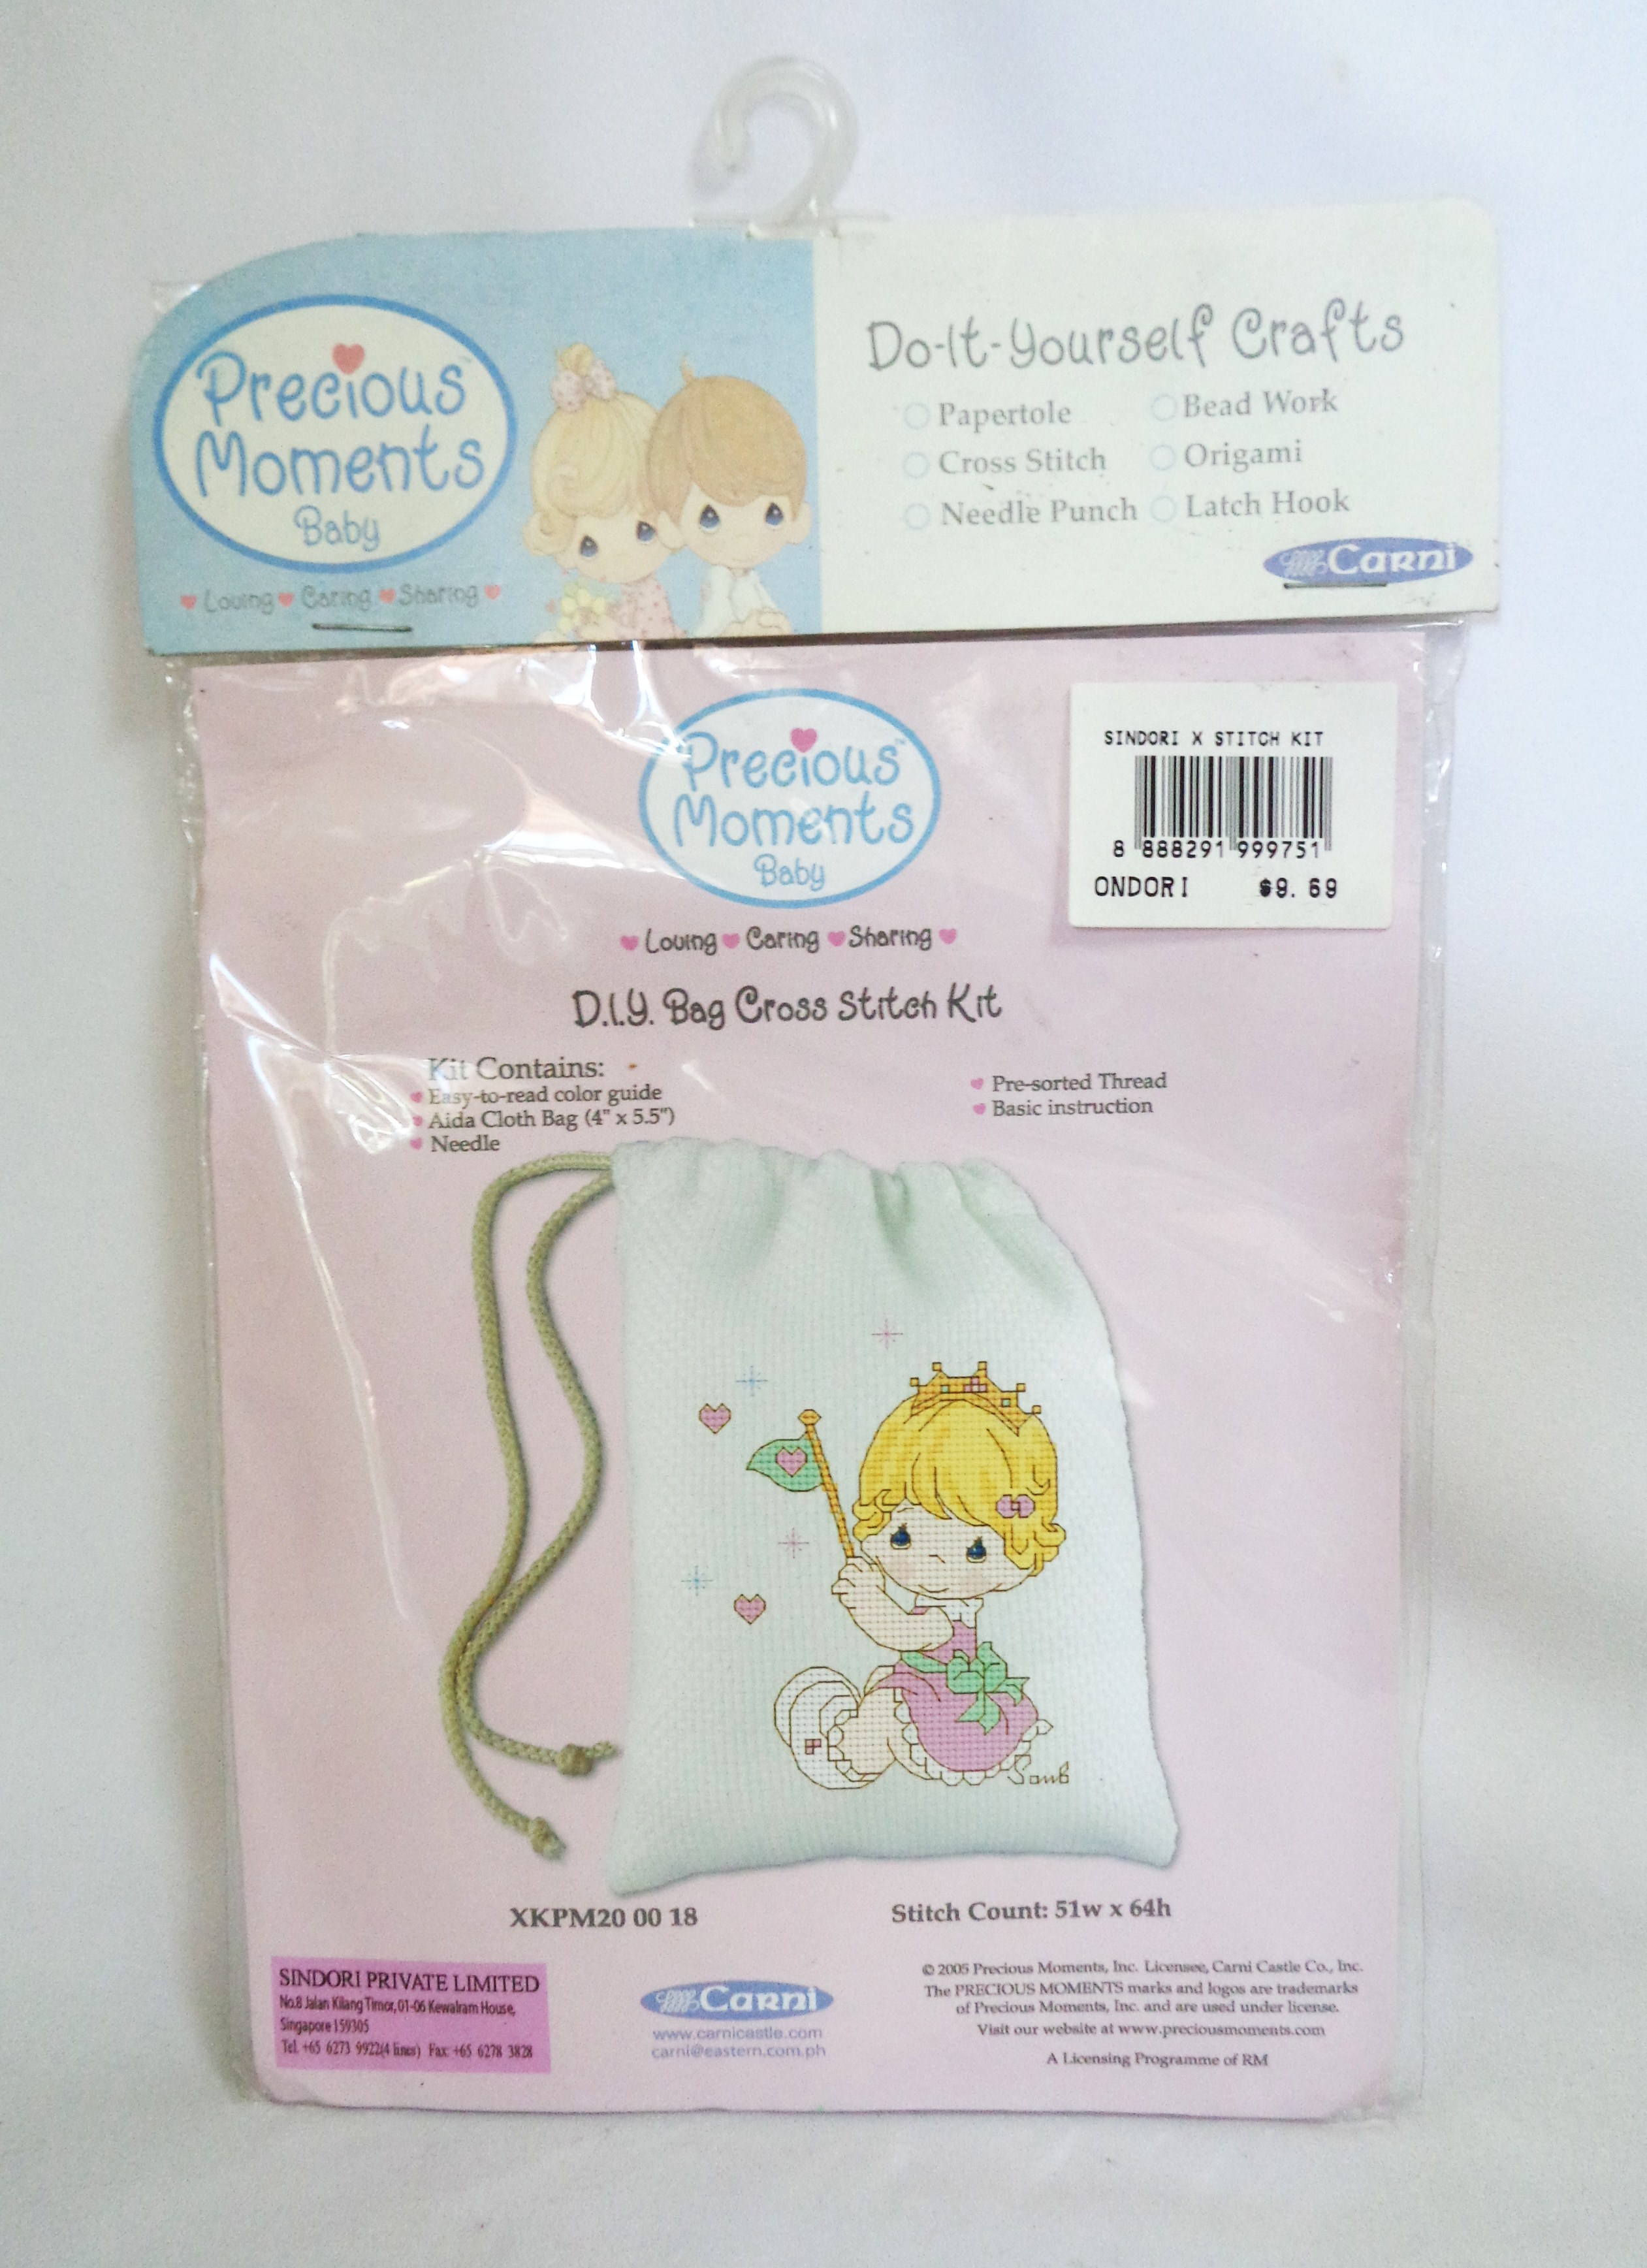 D.I.Y.Bag Cross Stitch Kit - Precious Moments